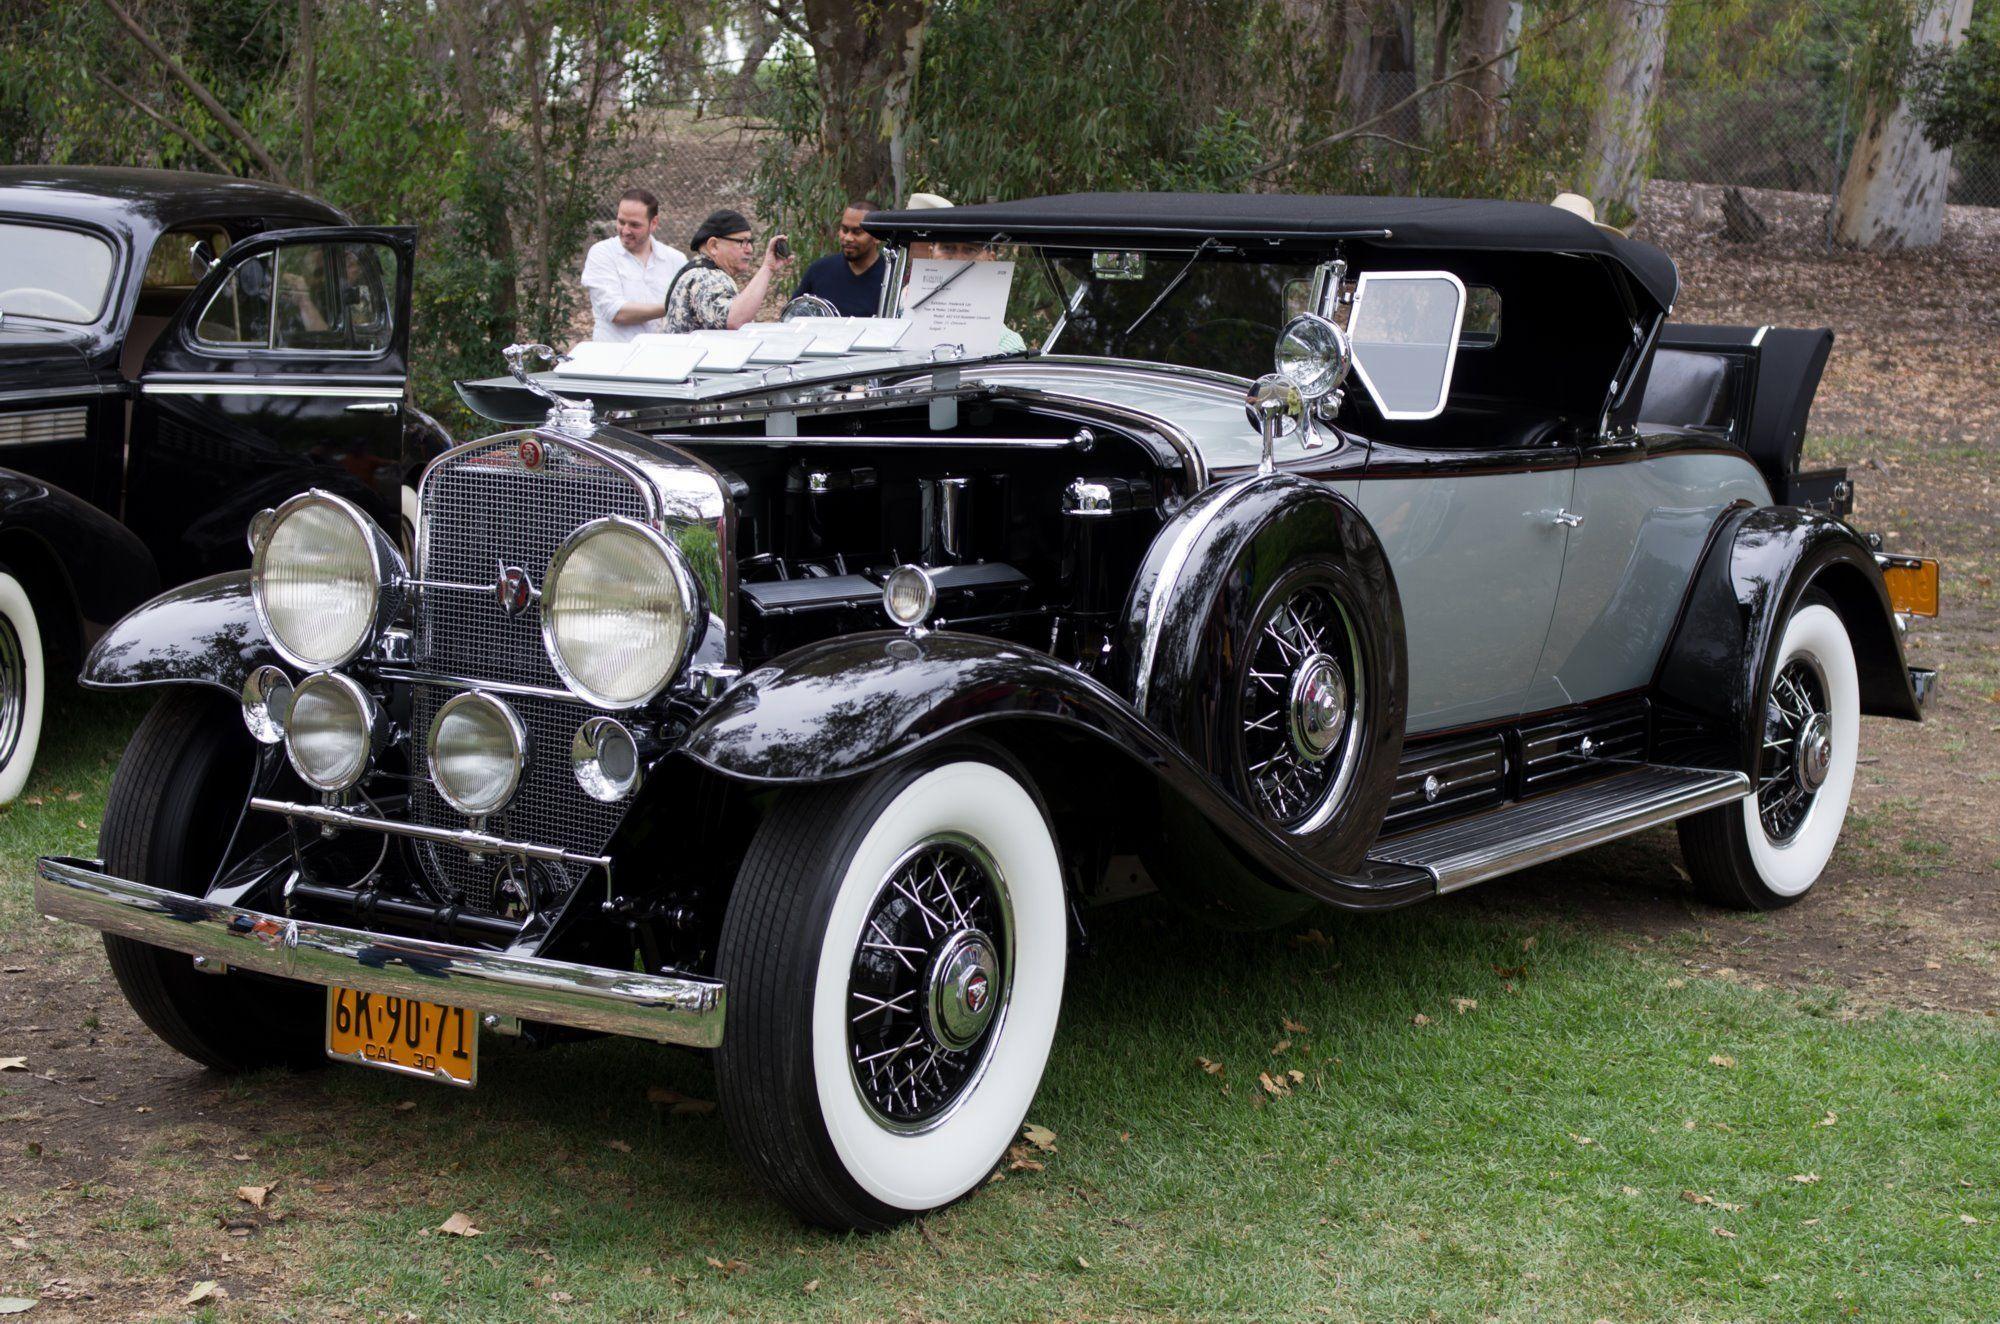 1930 Cadillac 452 V16 Roadster | Cars - Old Classics | Pinterest ...